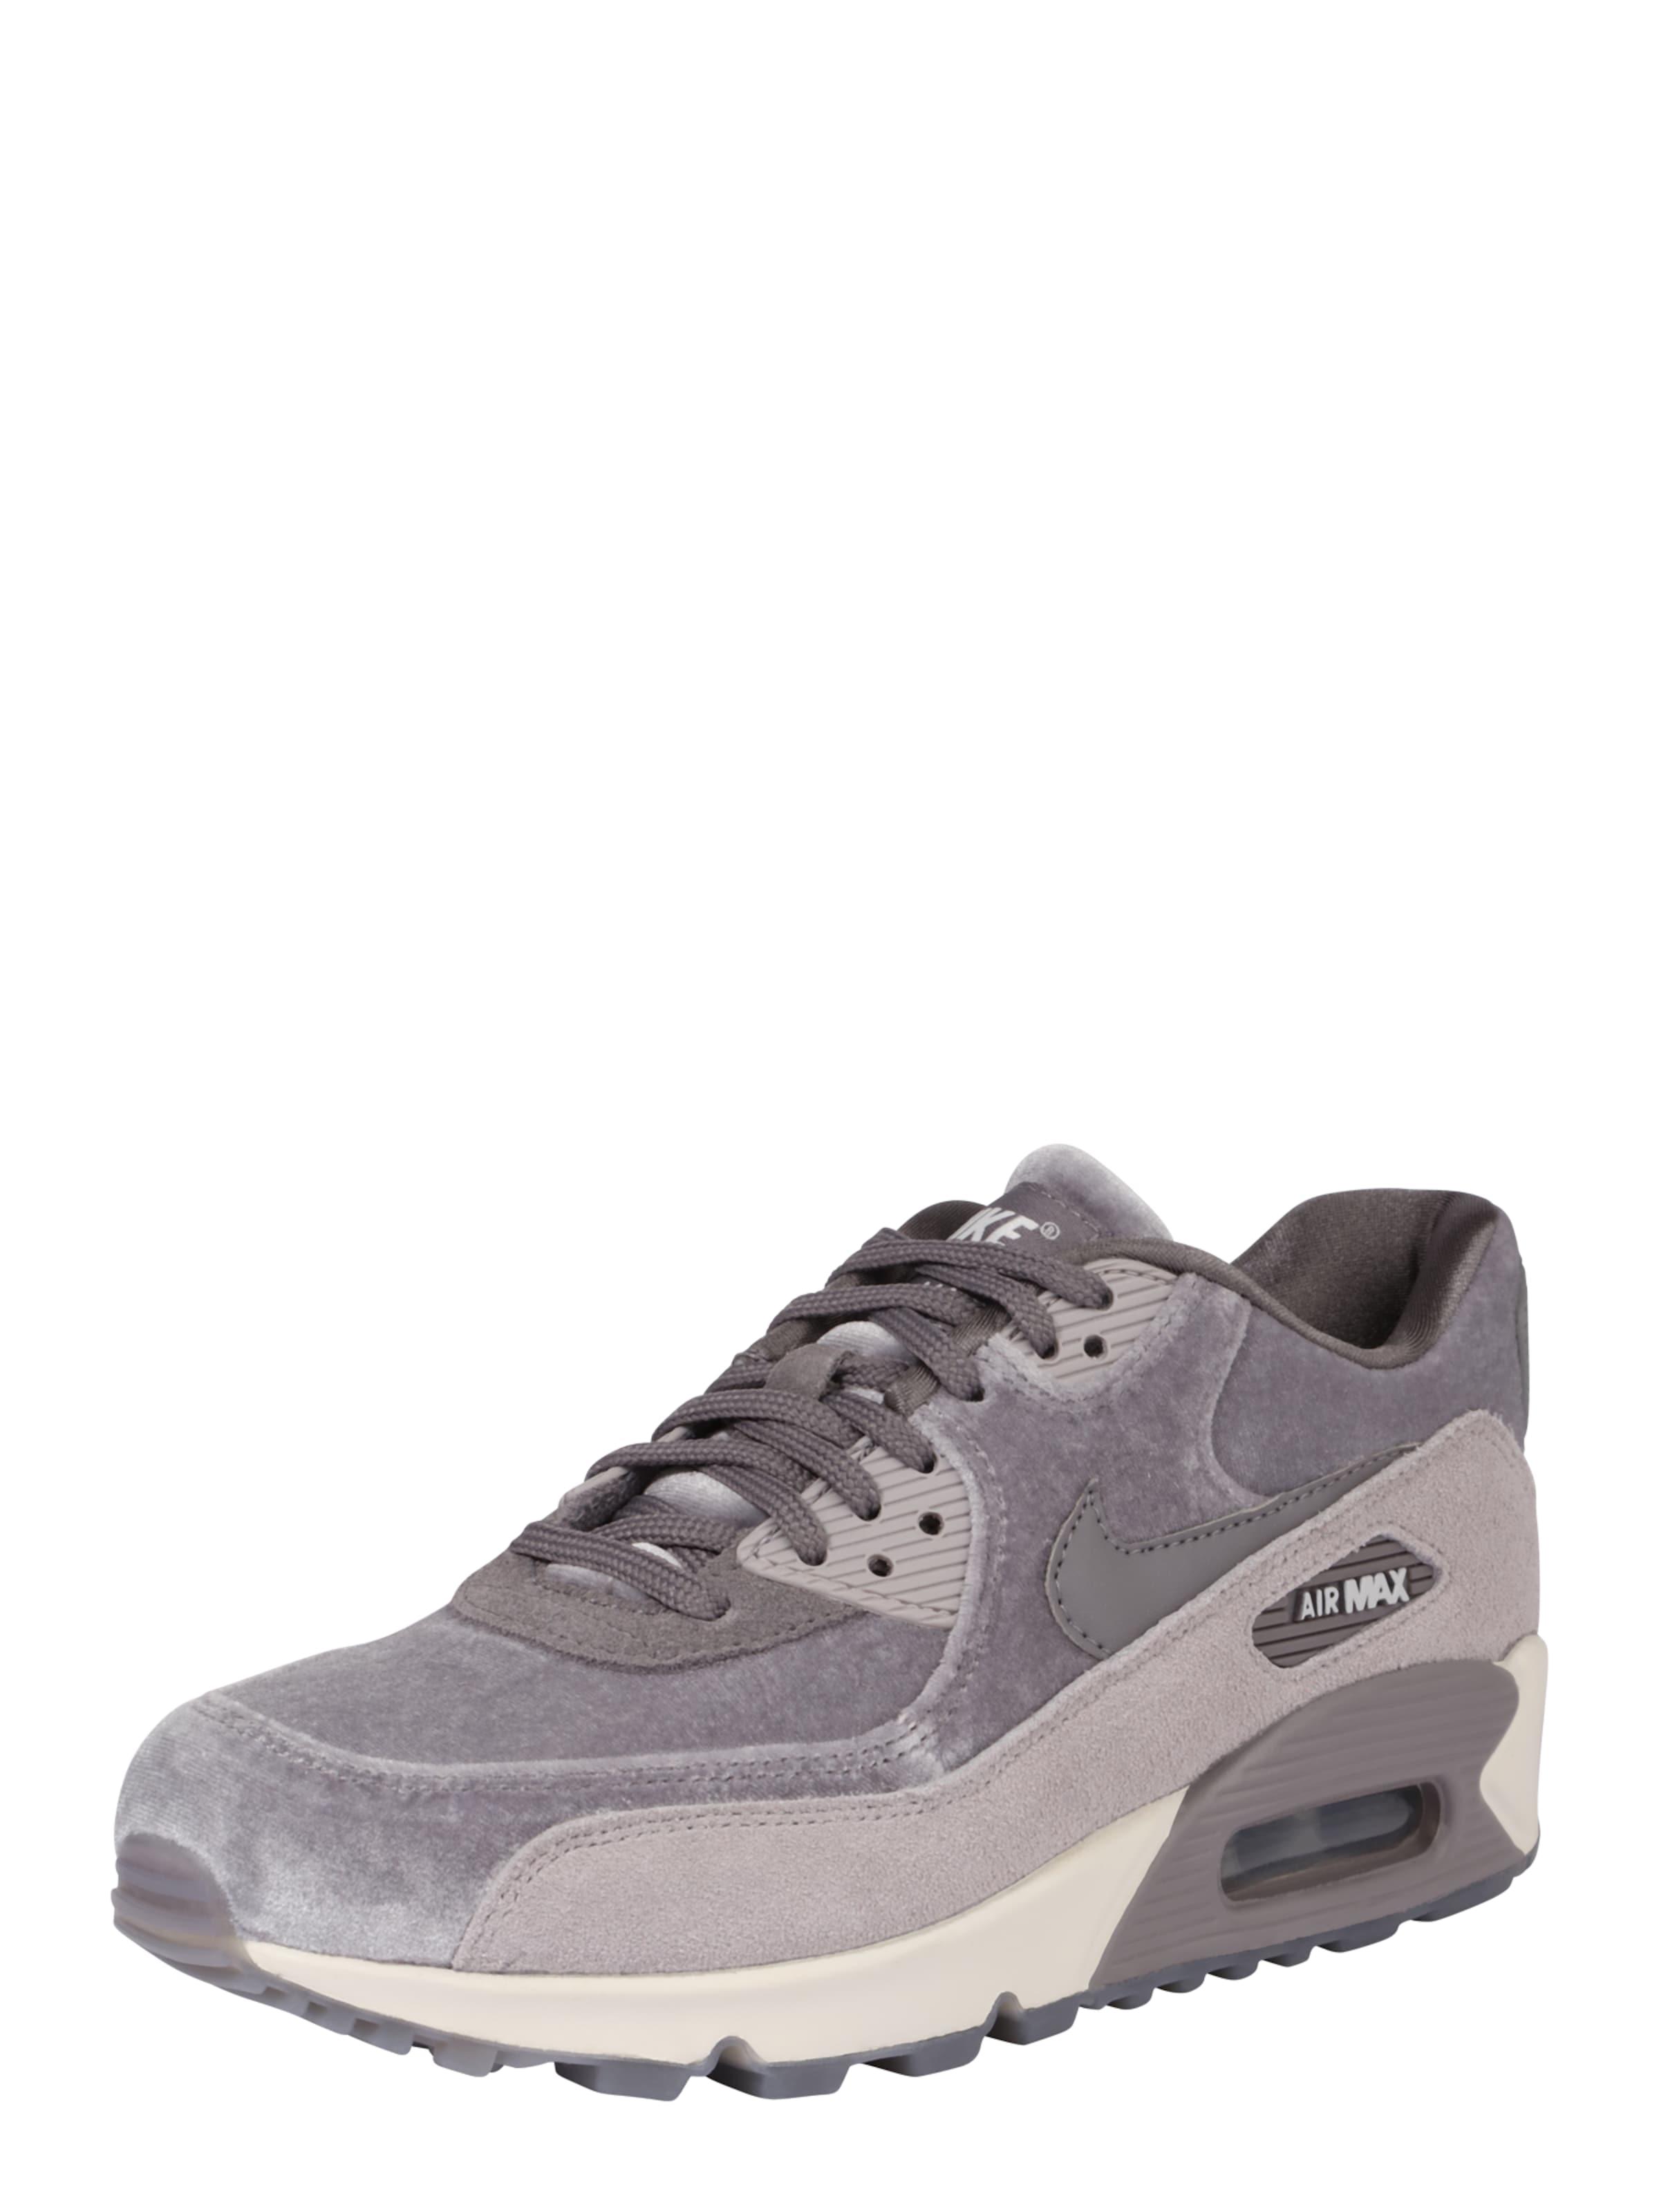 Chaussures De Sport Nike Sportswear Bas « Air Max 90 Lx « Gris / Violet R9tbBbe